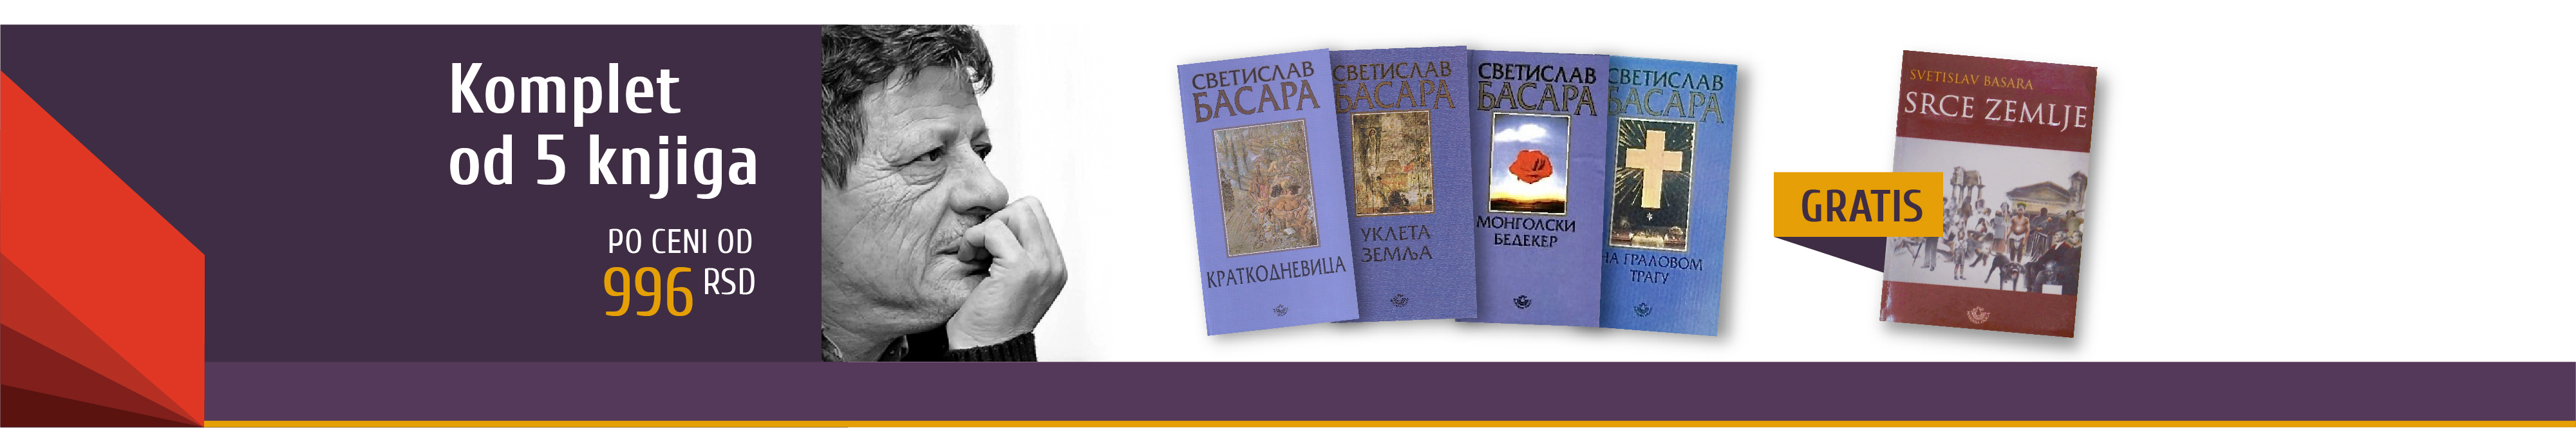 kupovine knjiga na online knjižari, Prednosti kupovine knjiga na online knjižari